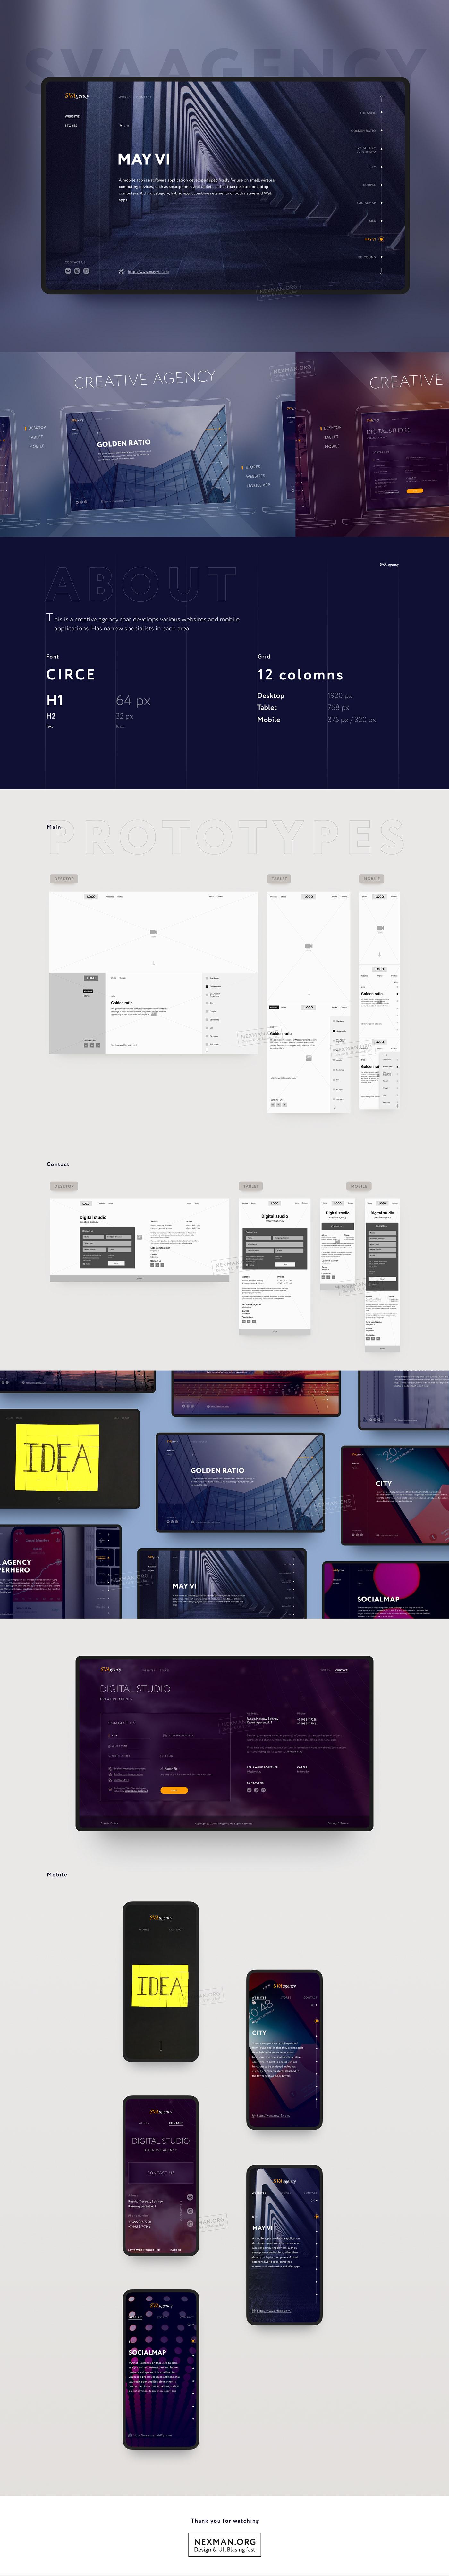 Adaptive agency app creative CRM Figma mobile photoshop prototype